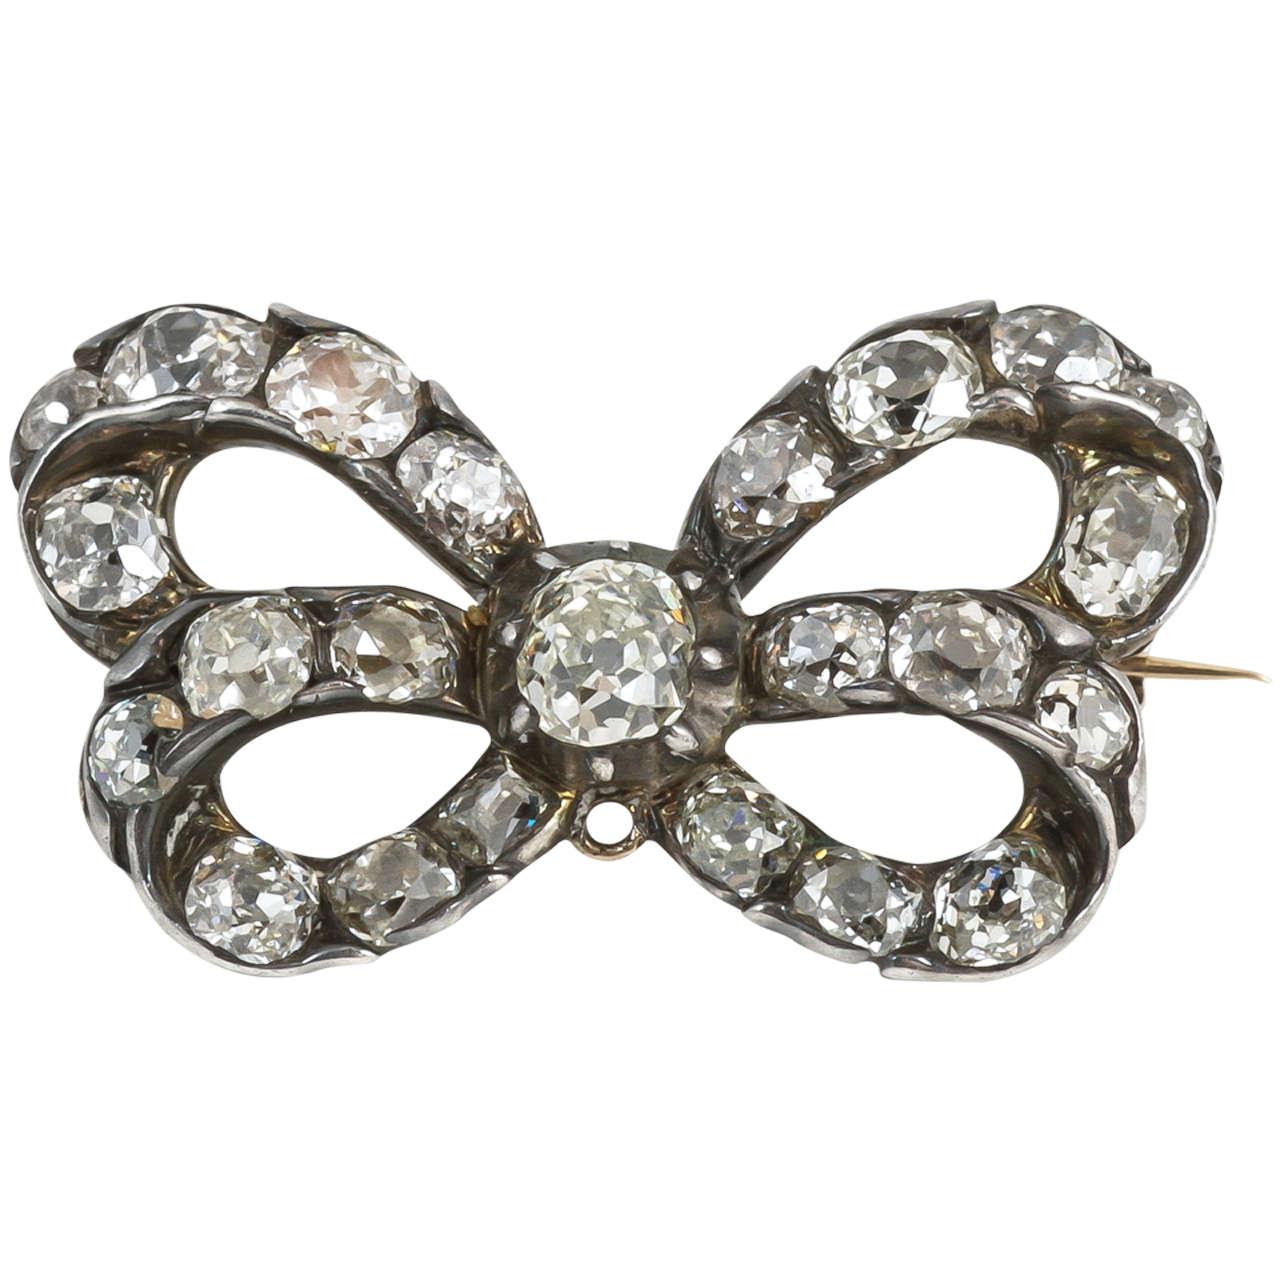 18th Century Cushion Cut Diamond Bow Brooch